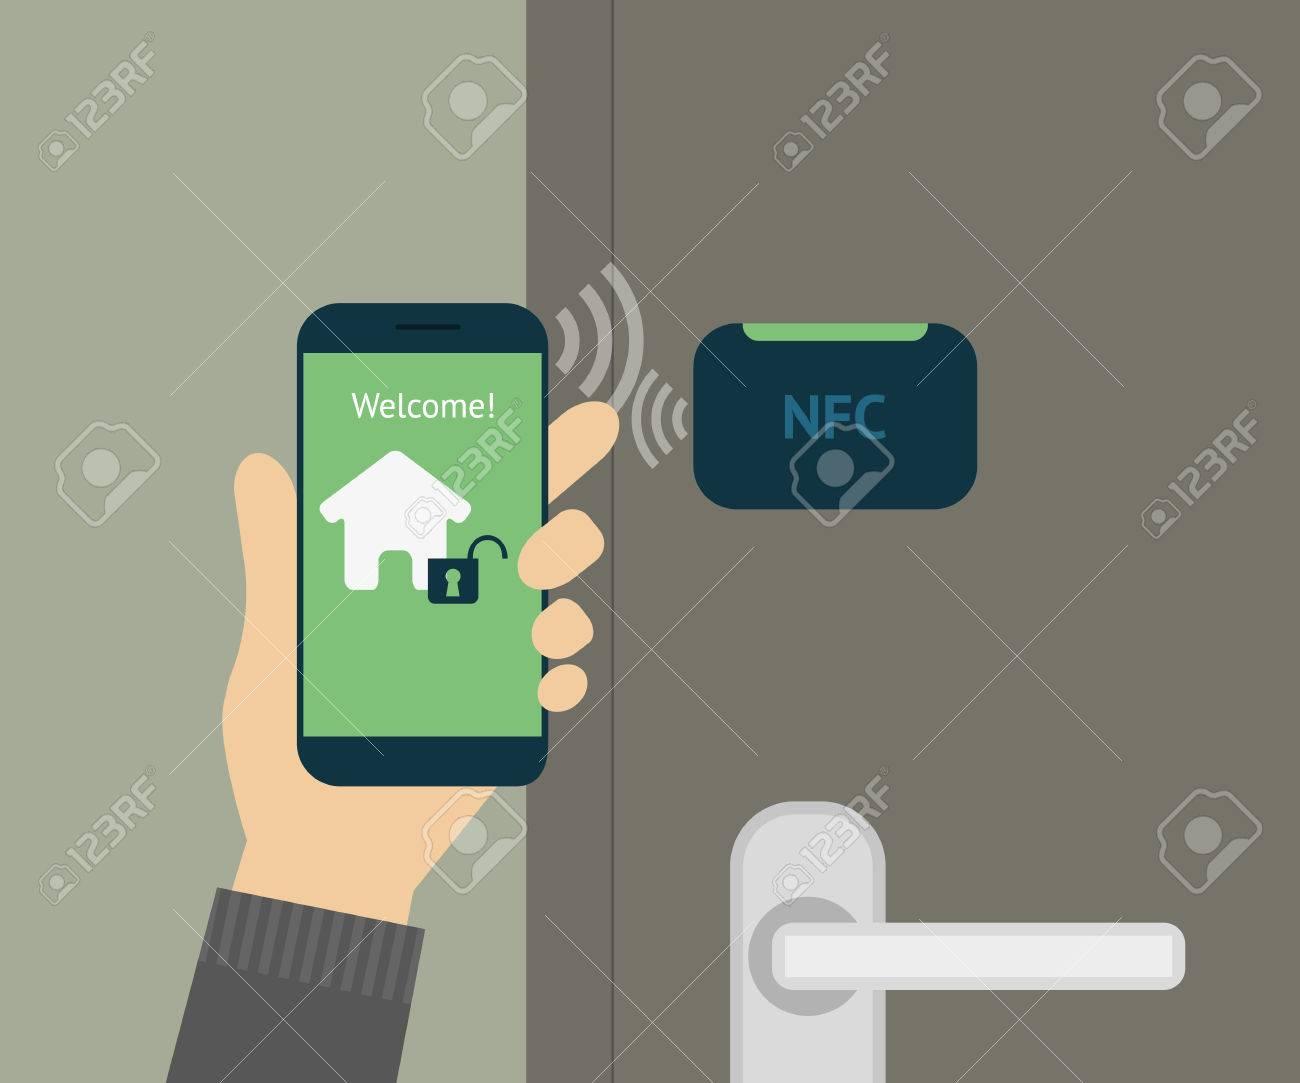 illustration of mobile unlocking home door via smartphone. - 31814220